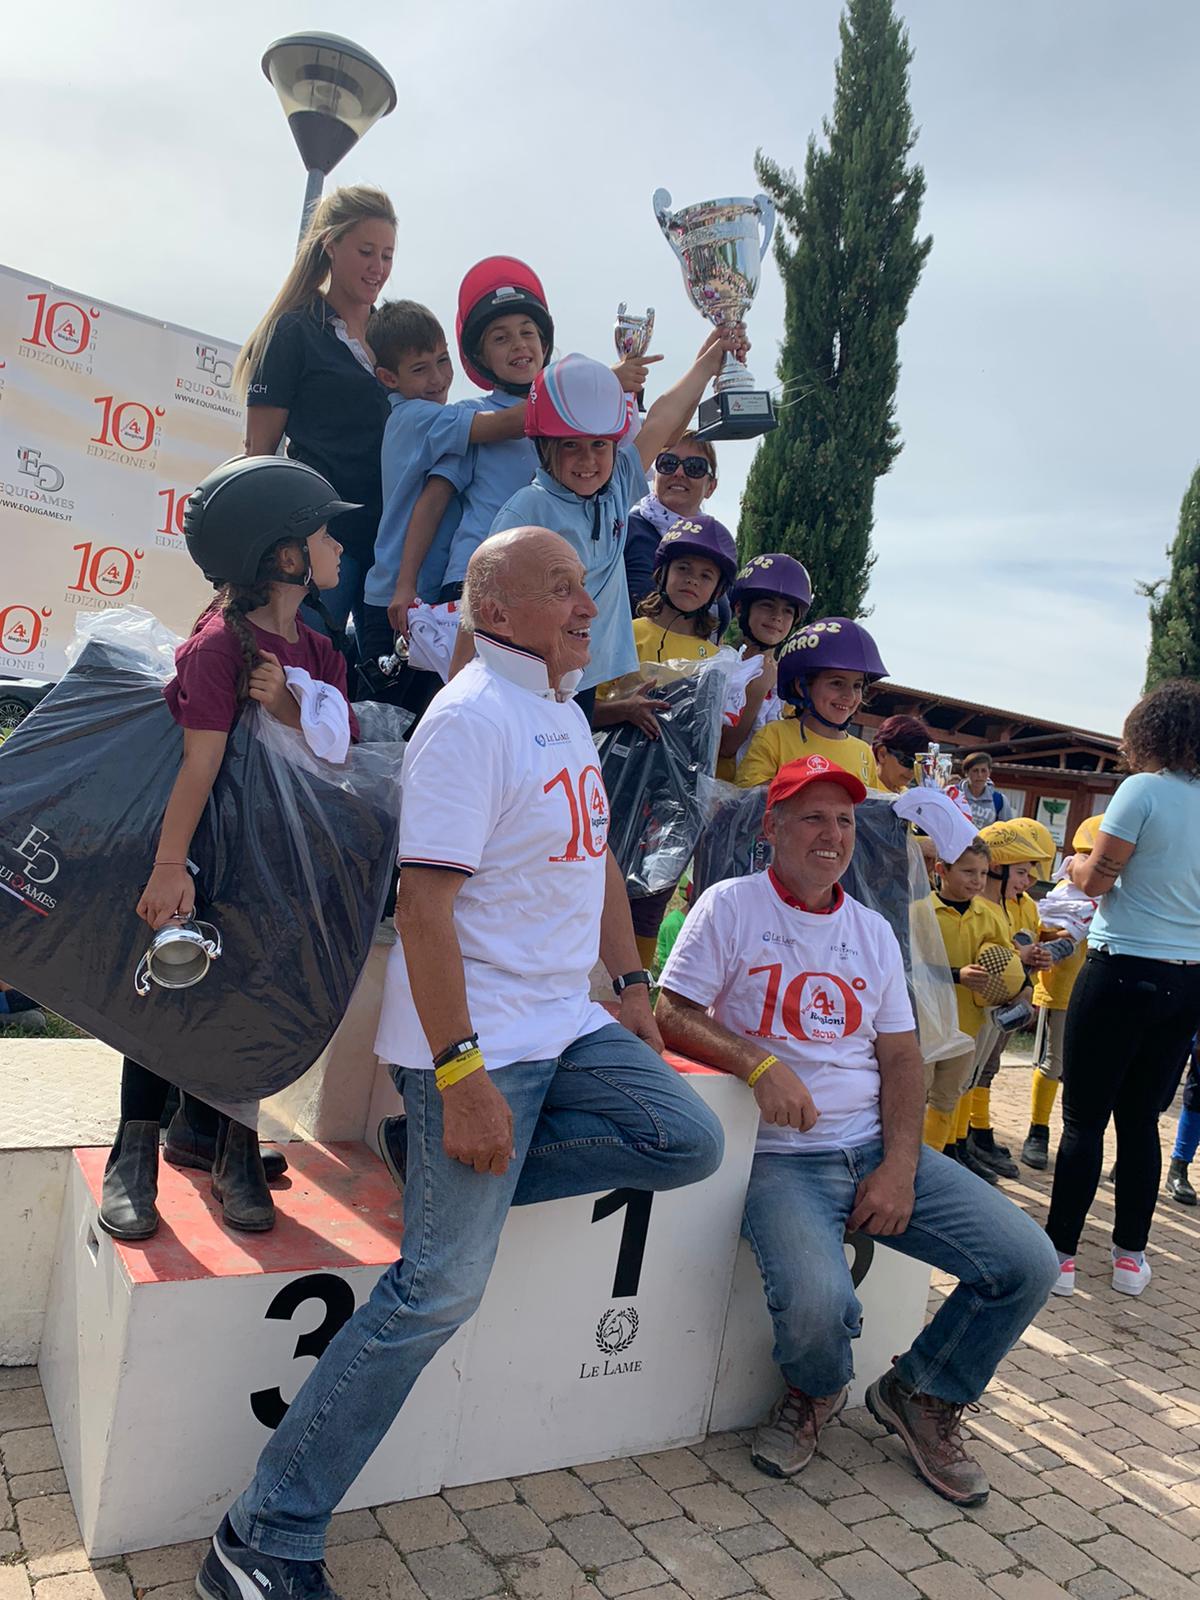 Trofeo 4 Regioni 4° tappa Montefalco (Pg) 11 – 13 ottobre 2019